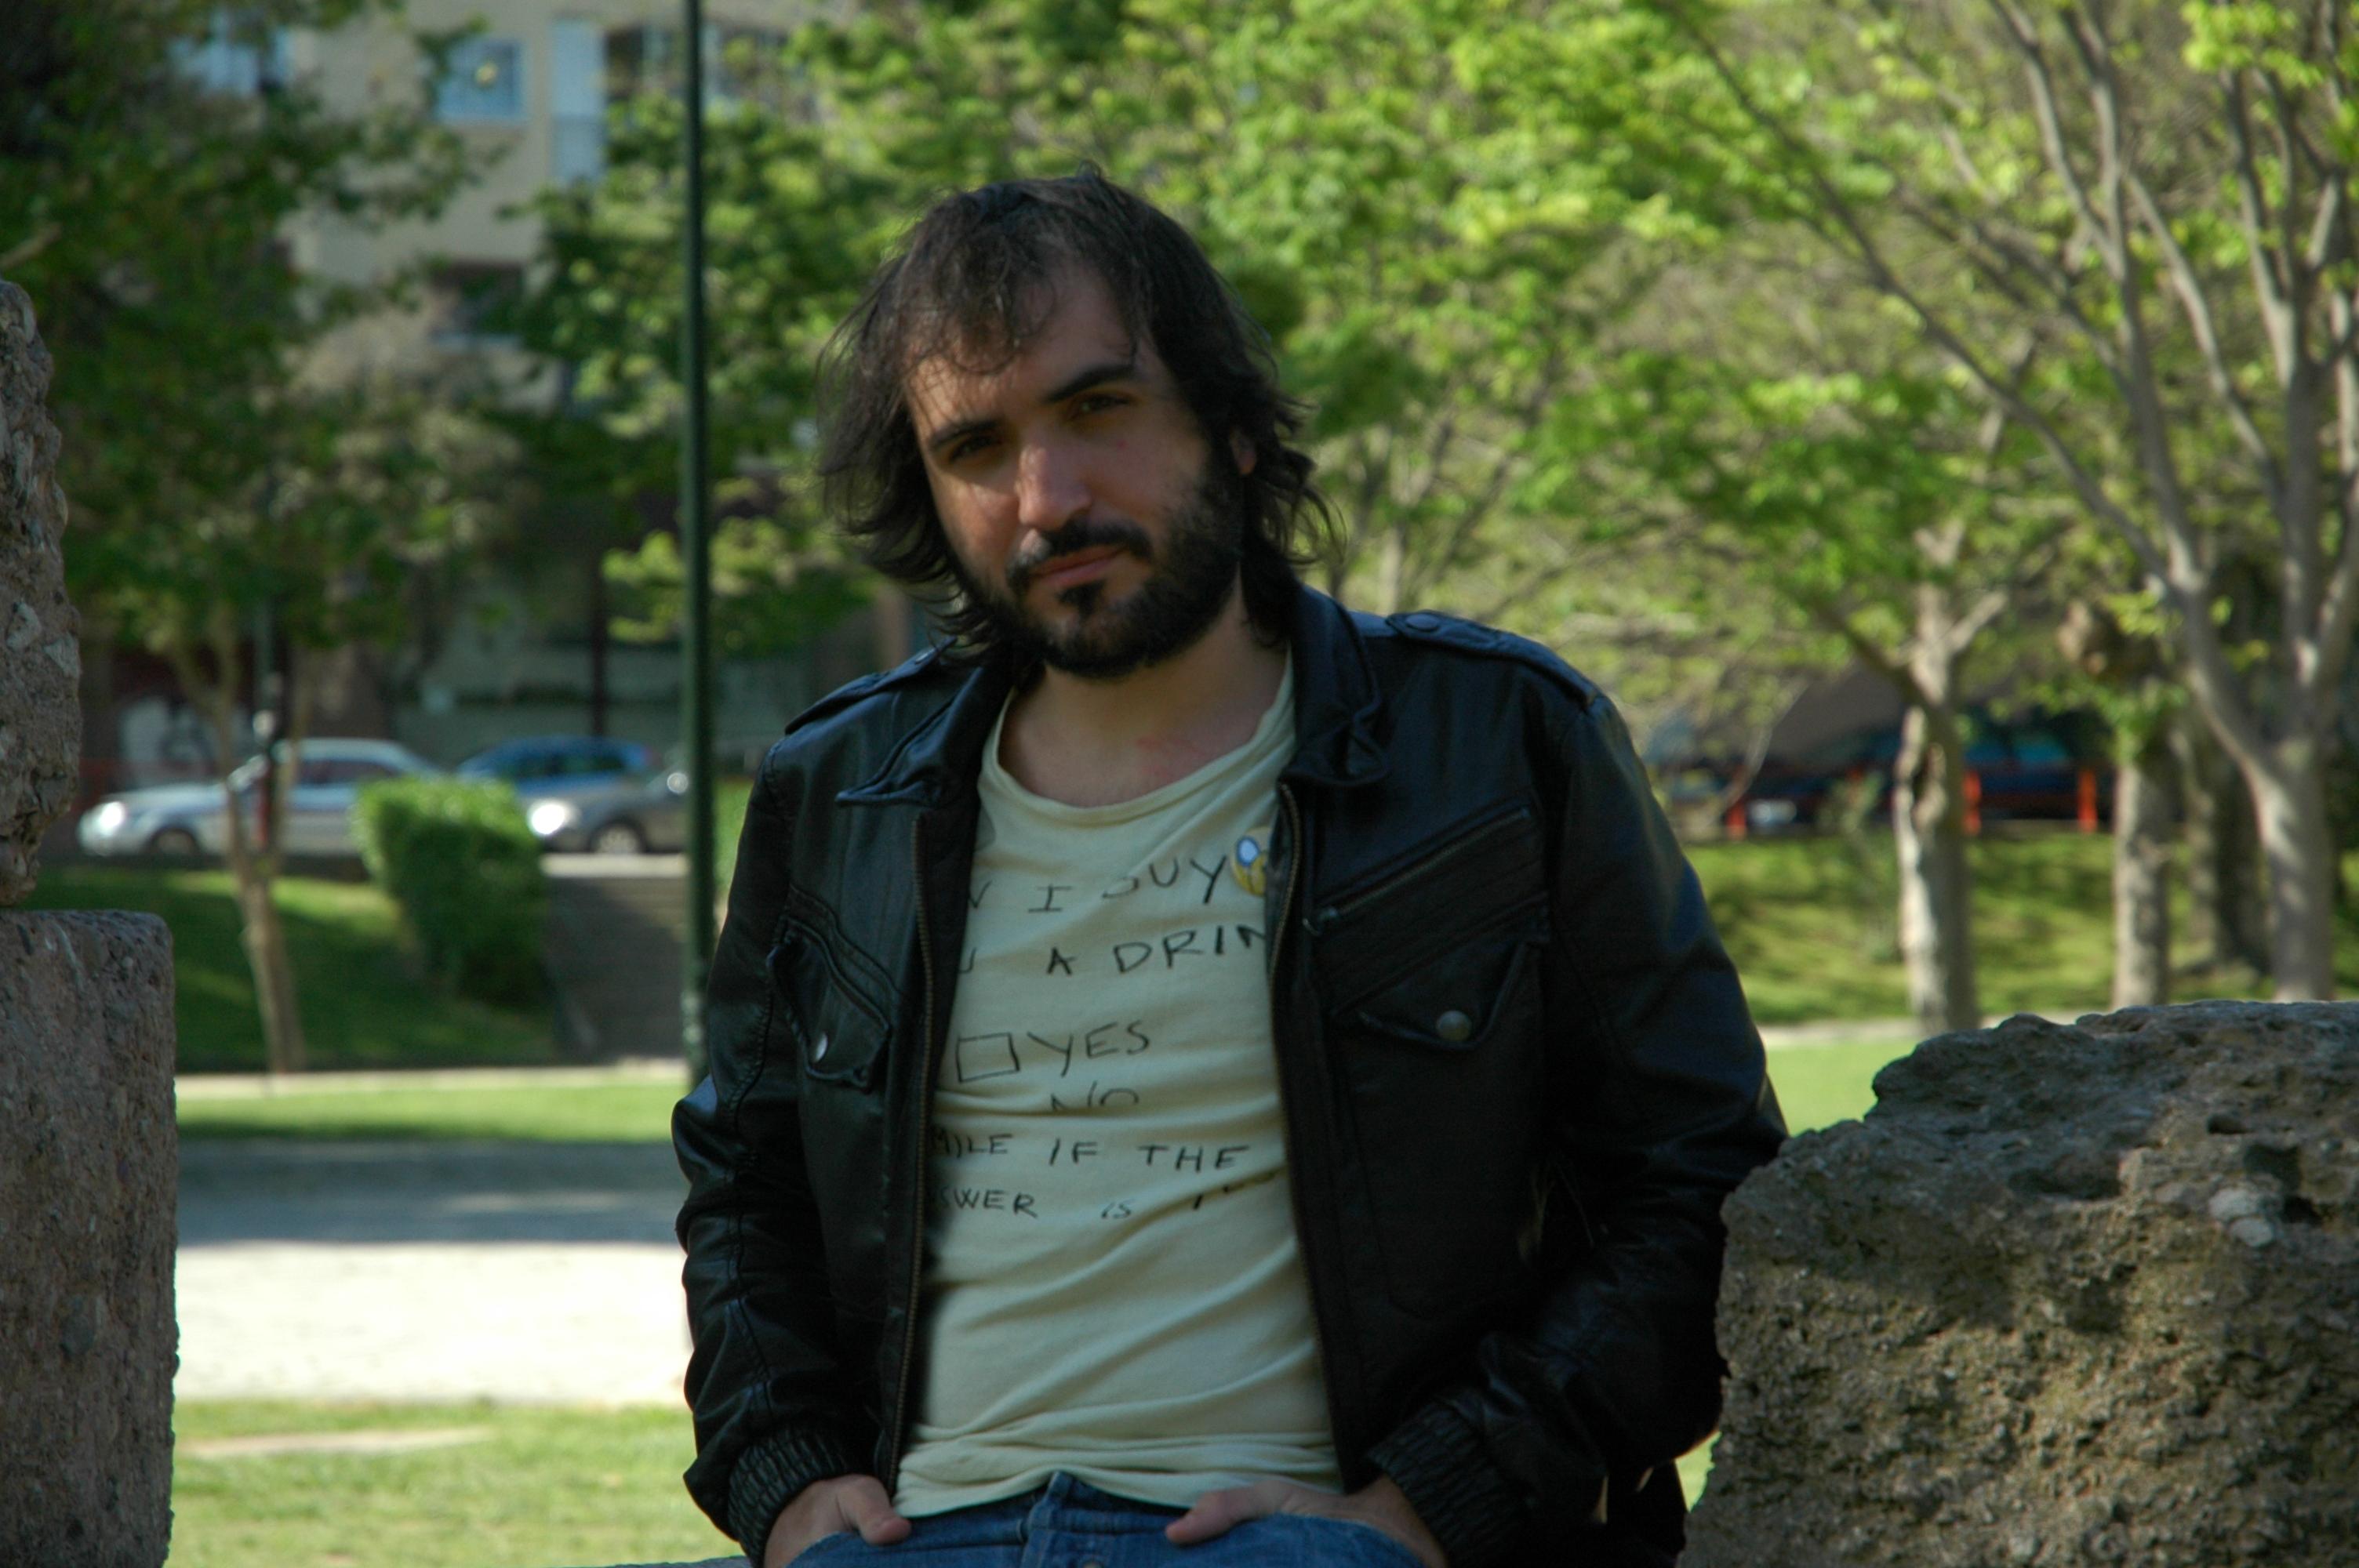 Book_1_David_Pallás_Gozalo_Parque_55